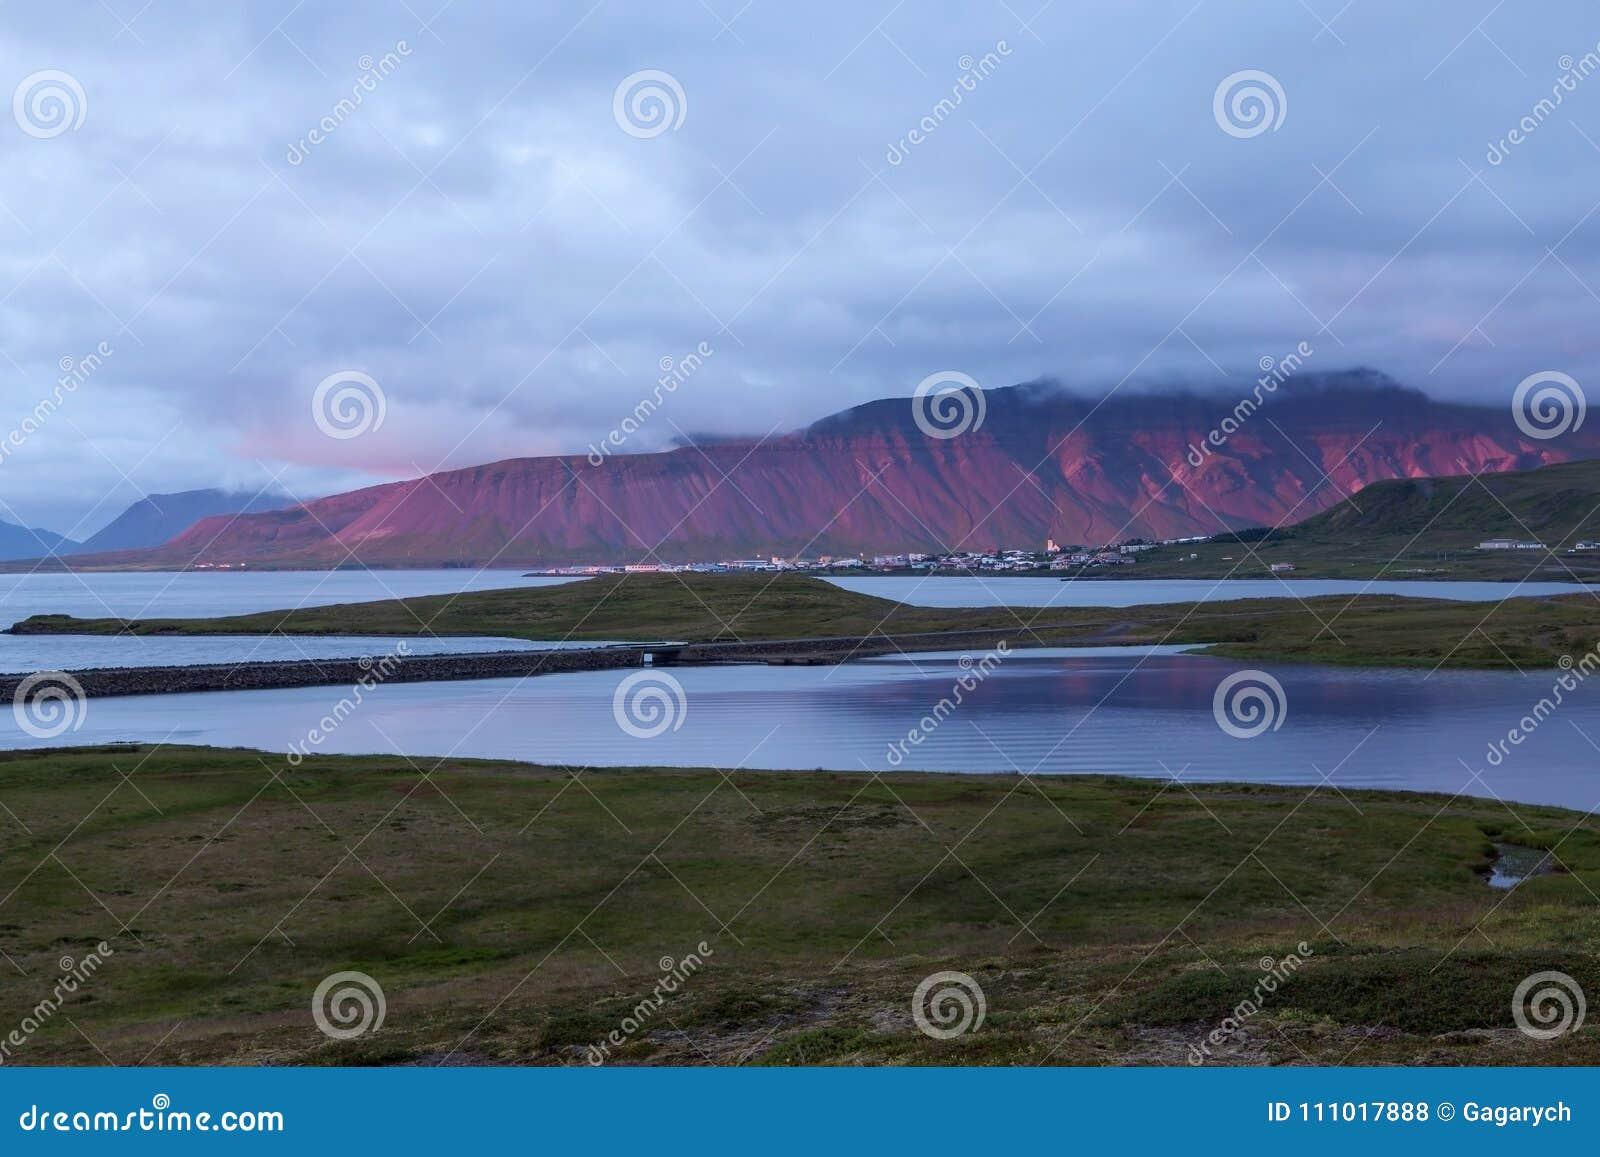 Stunning red mountain behind Grundarfjordur town.